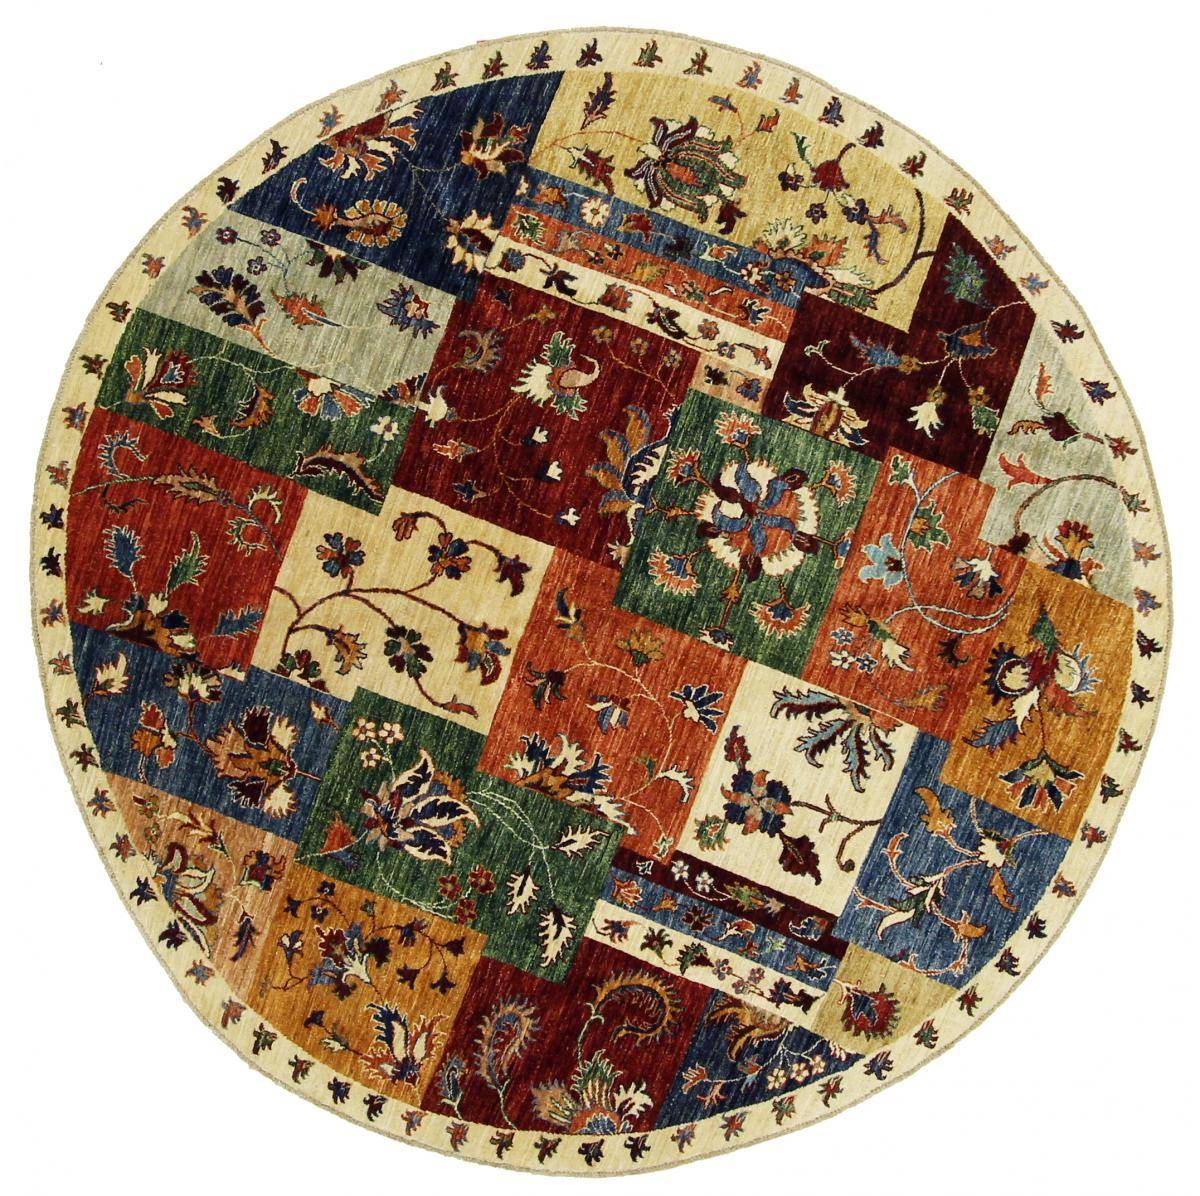 nain trading tappeto orientale arijana puzzle 201x200 rossoondo beige/marrone (pakistan, lana, annodato a mano)